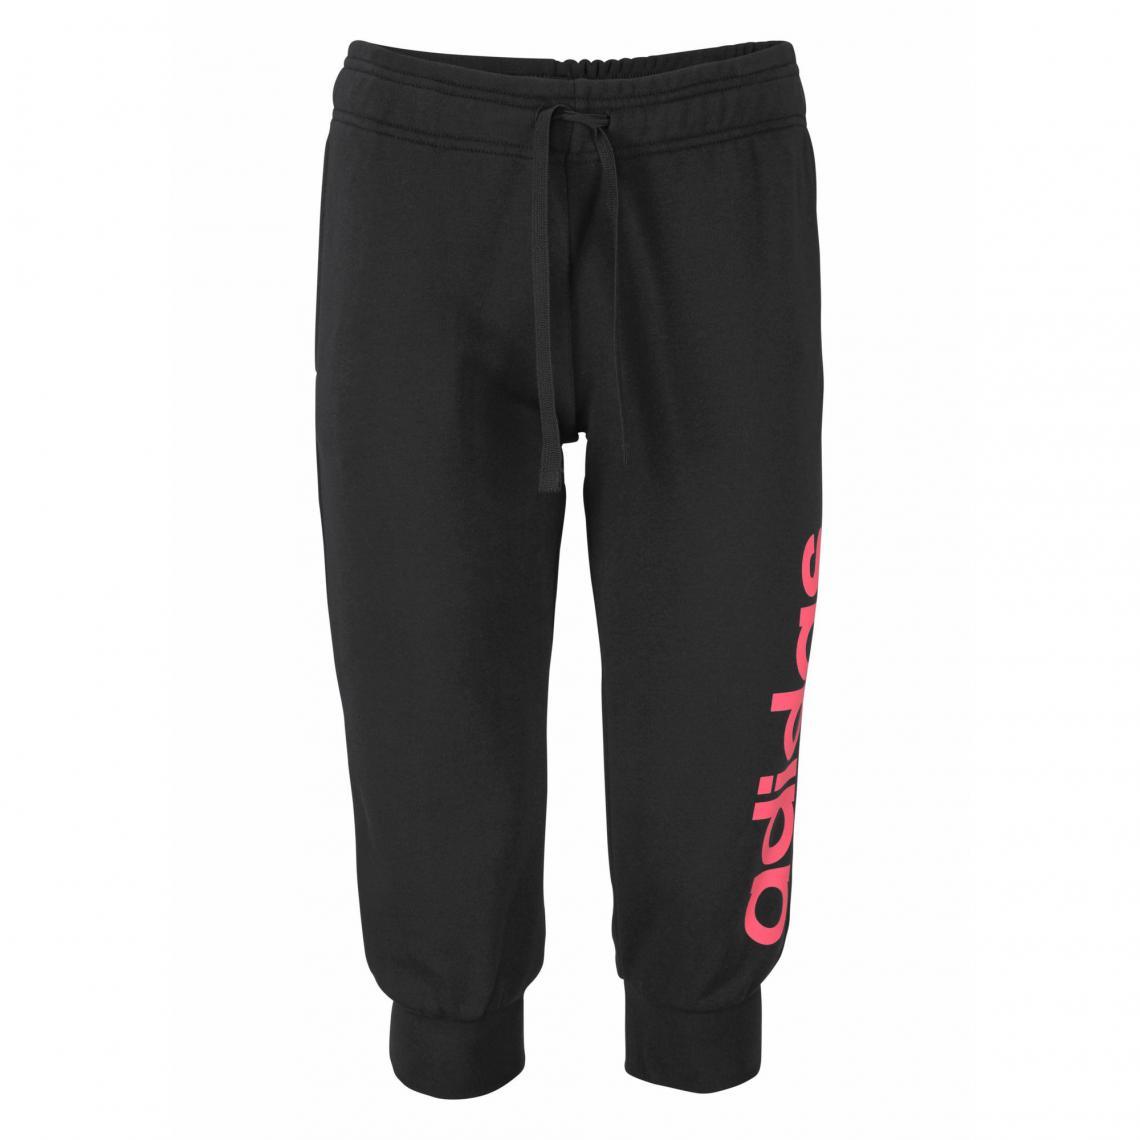 Jogging ADIDAS Performance Essential Linear ¾ pant pour femme - Noir Adidas  Performance 3dfb7fb39b1